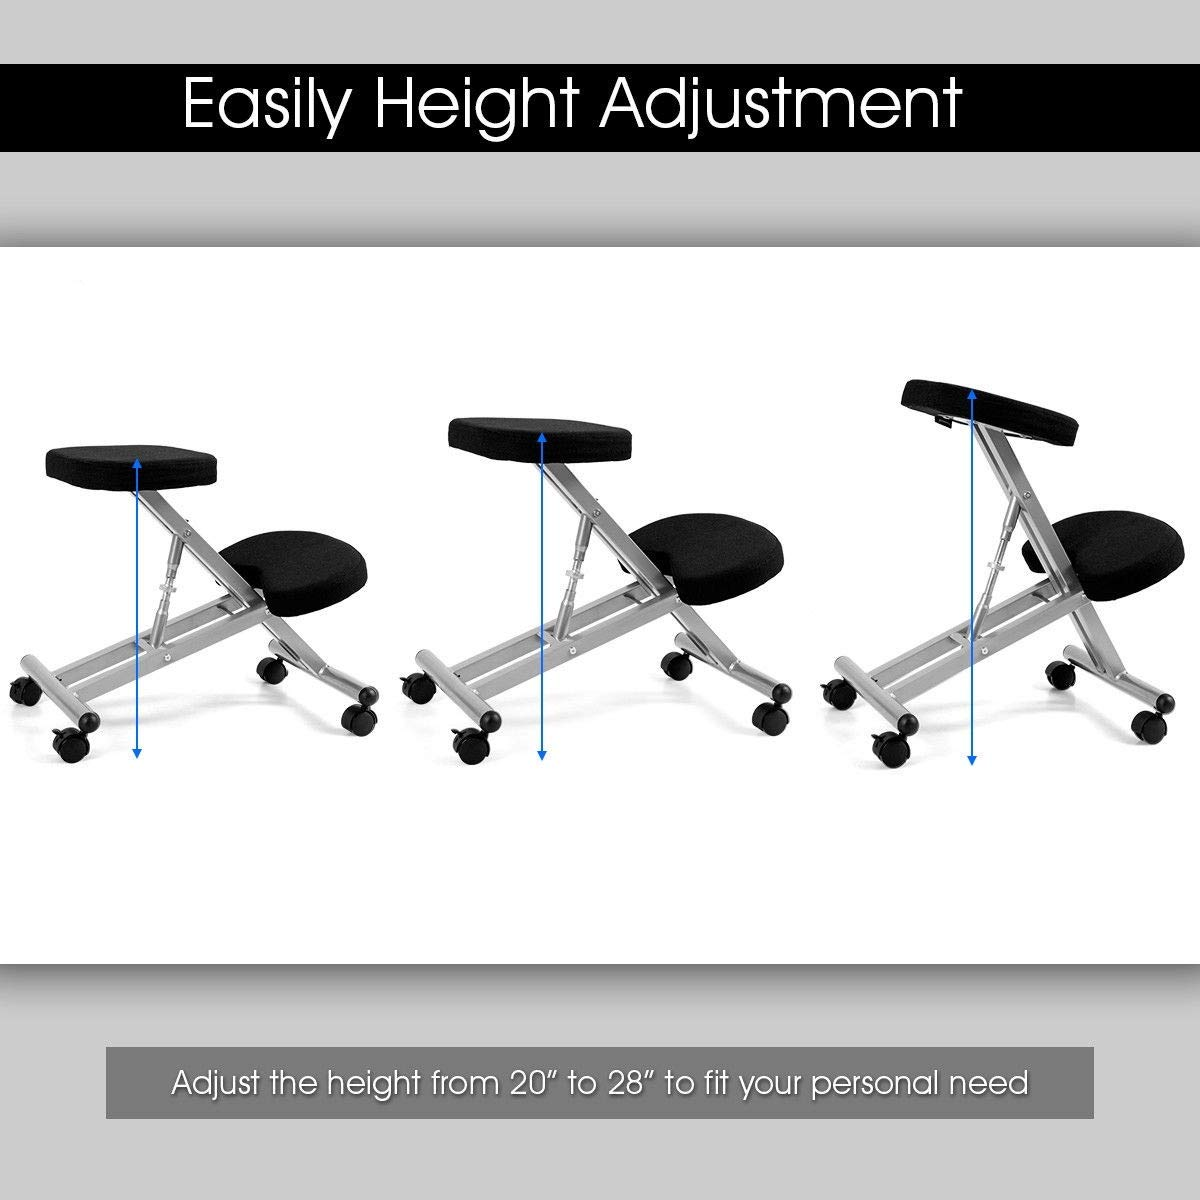 Amazon.com: Kovalentor - Silla ergonómica para arrodillarse ...